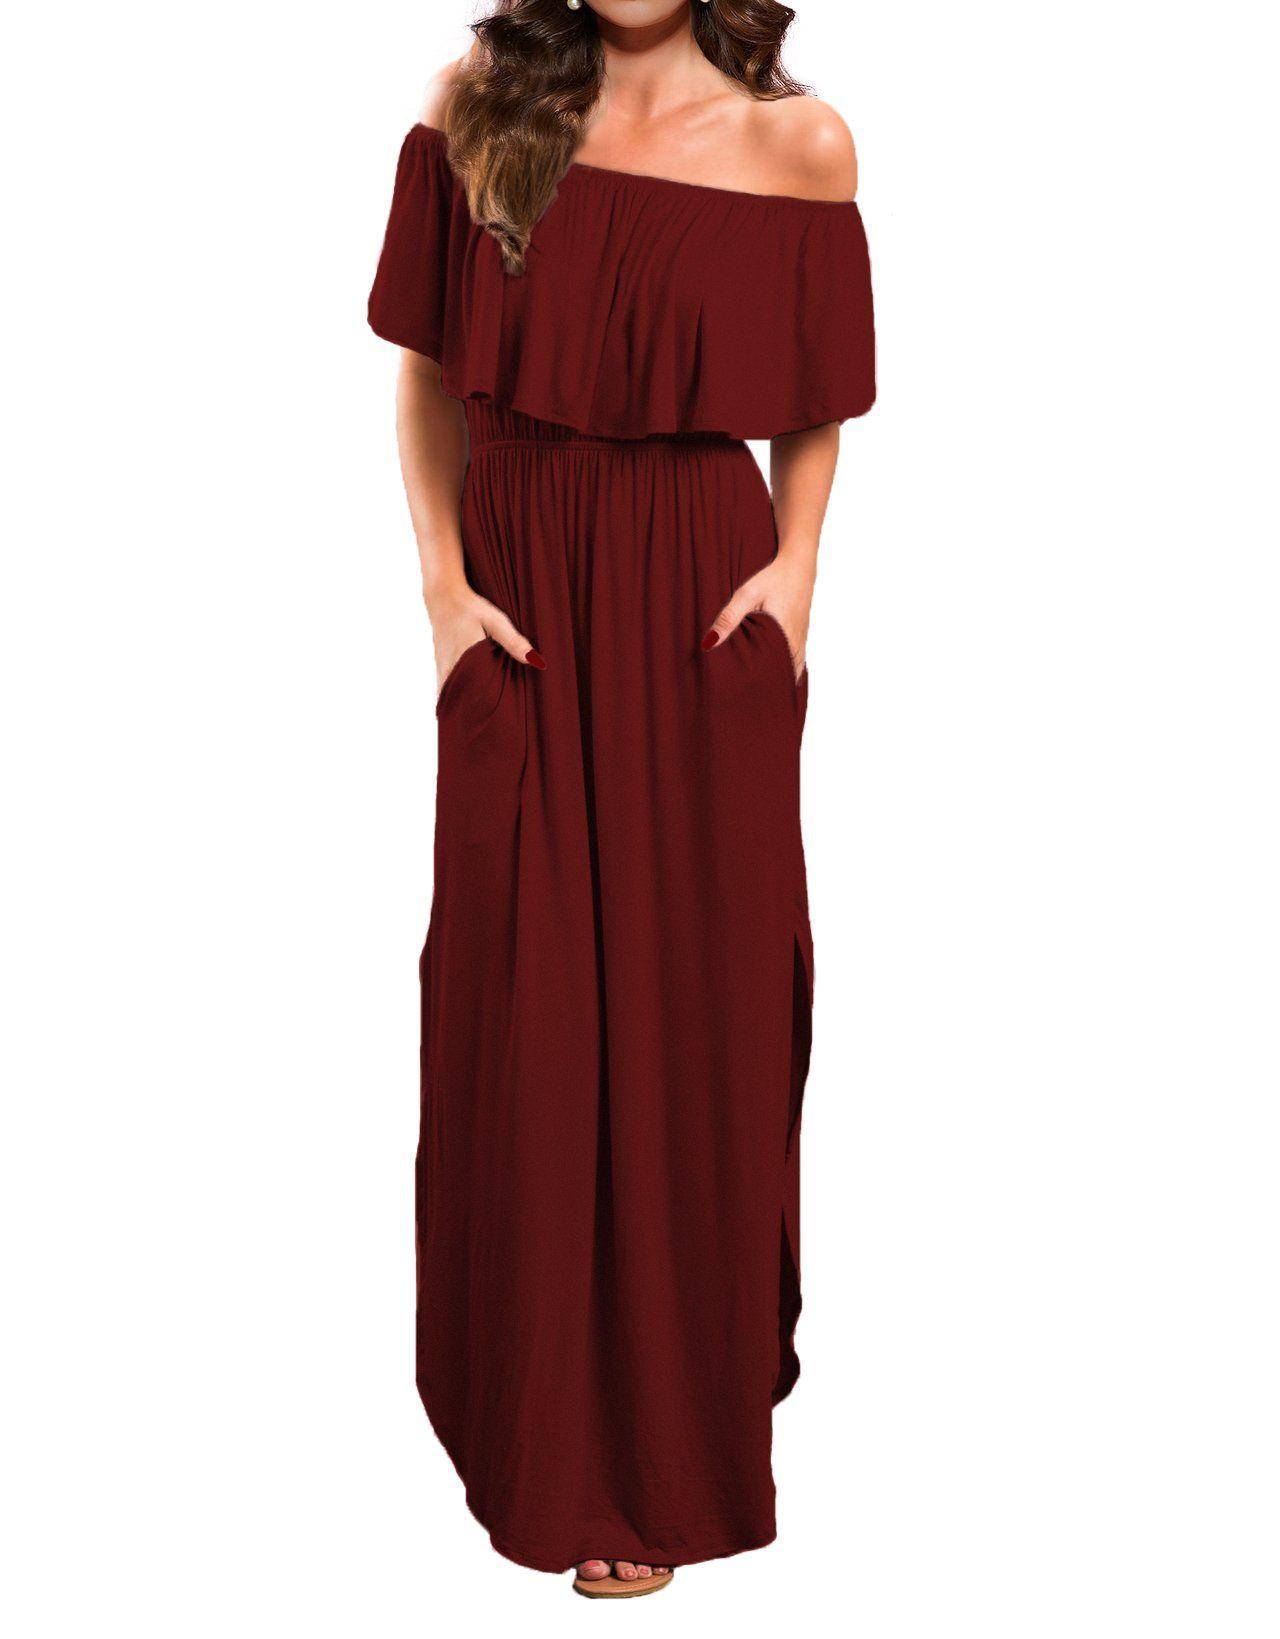 ba2c04aa1de5 VERABENDI Womens Off Shoulder Summer Casual Long Ruffle Beach Maxi Dress  with Pockets Burgundy Medium     See this great product.